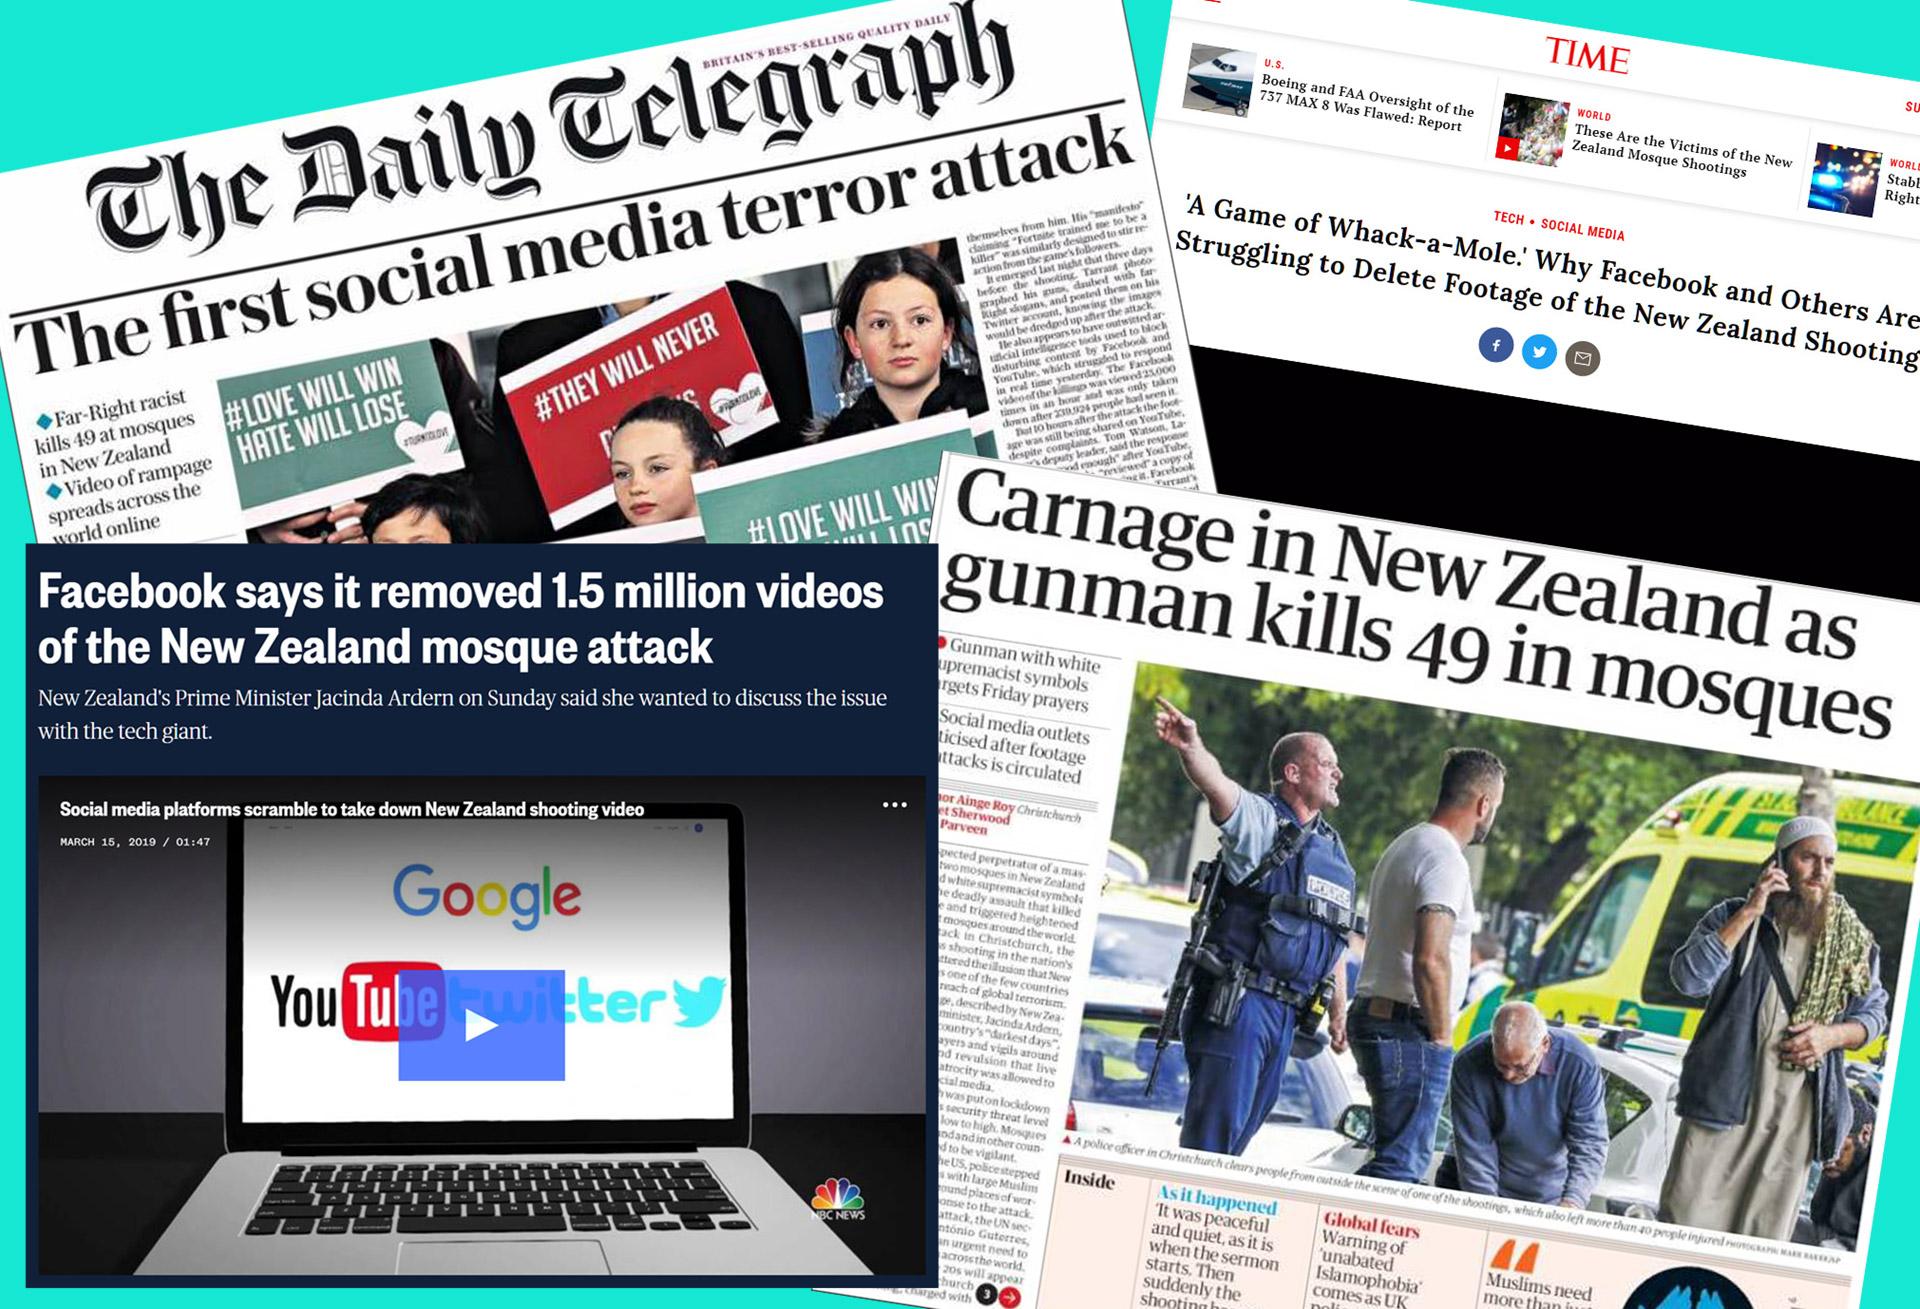 Christchurch social media